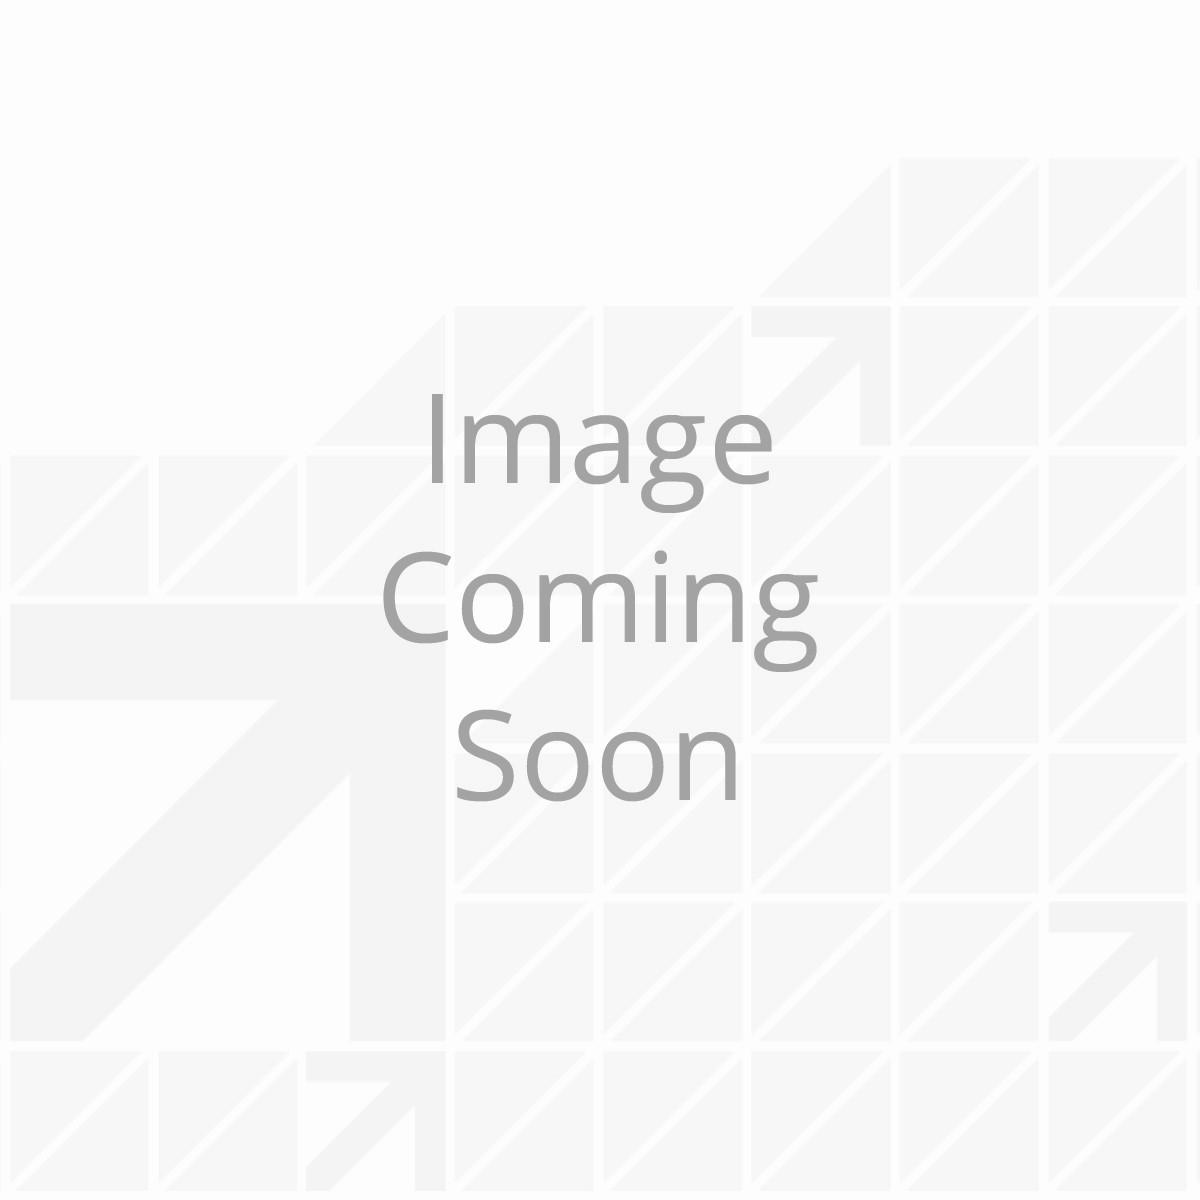 LED Light Module - Lippert™ Power Tongue Jack (V2)